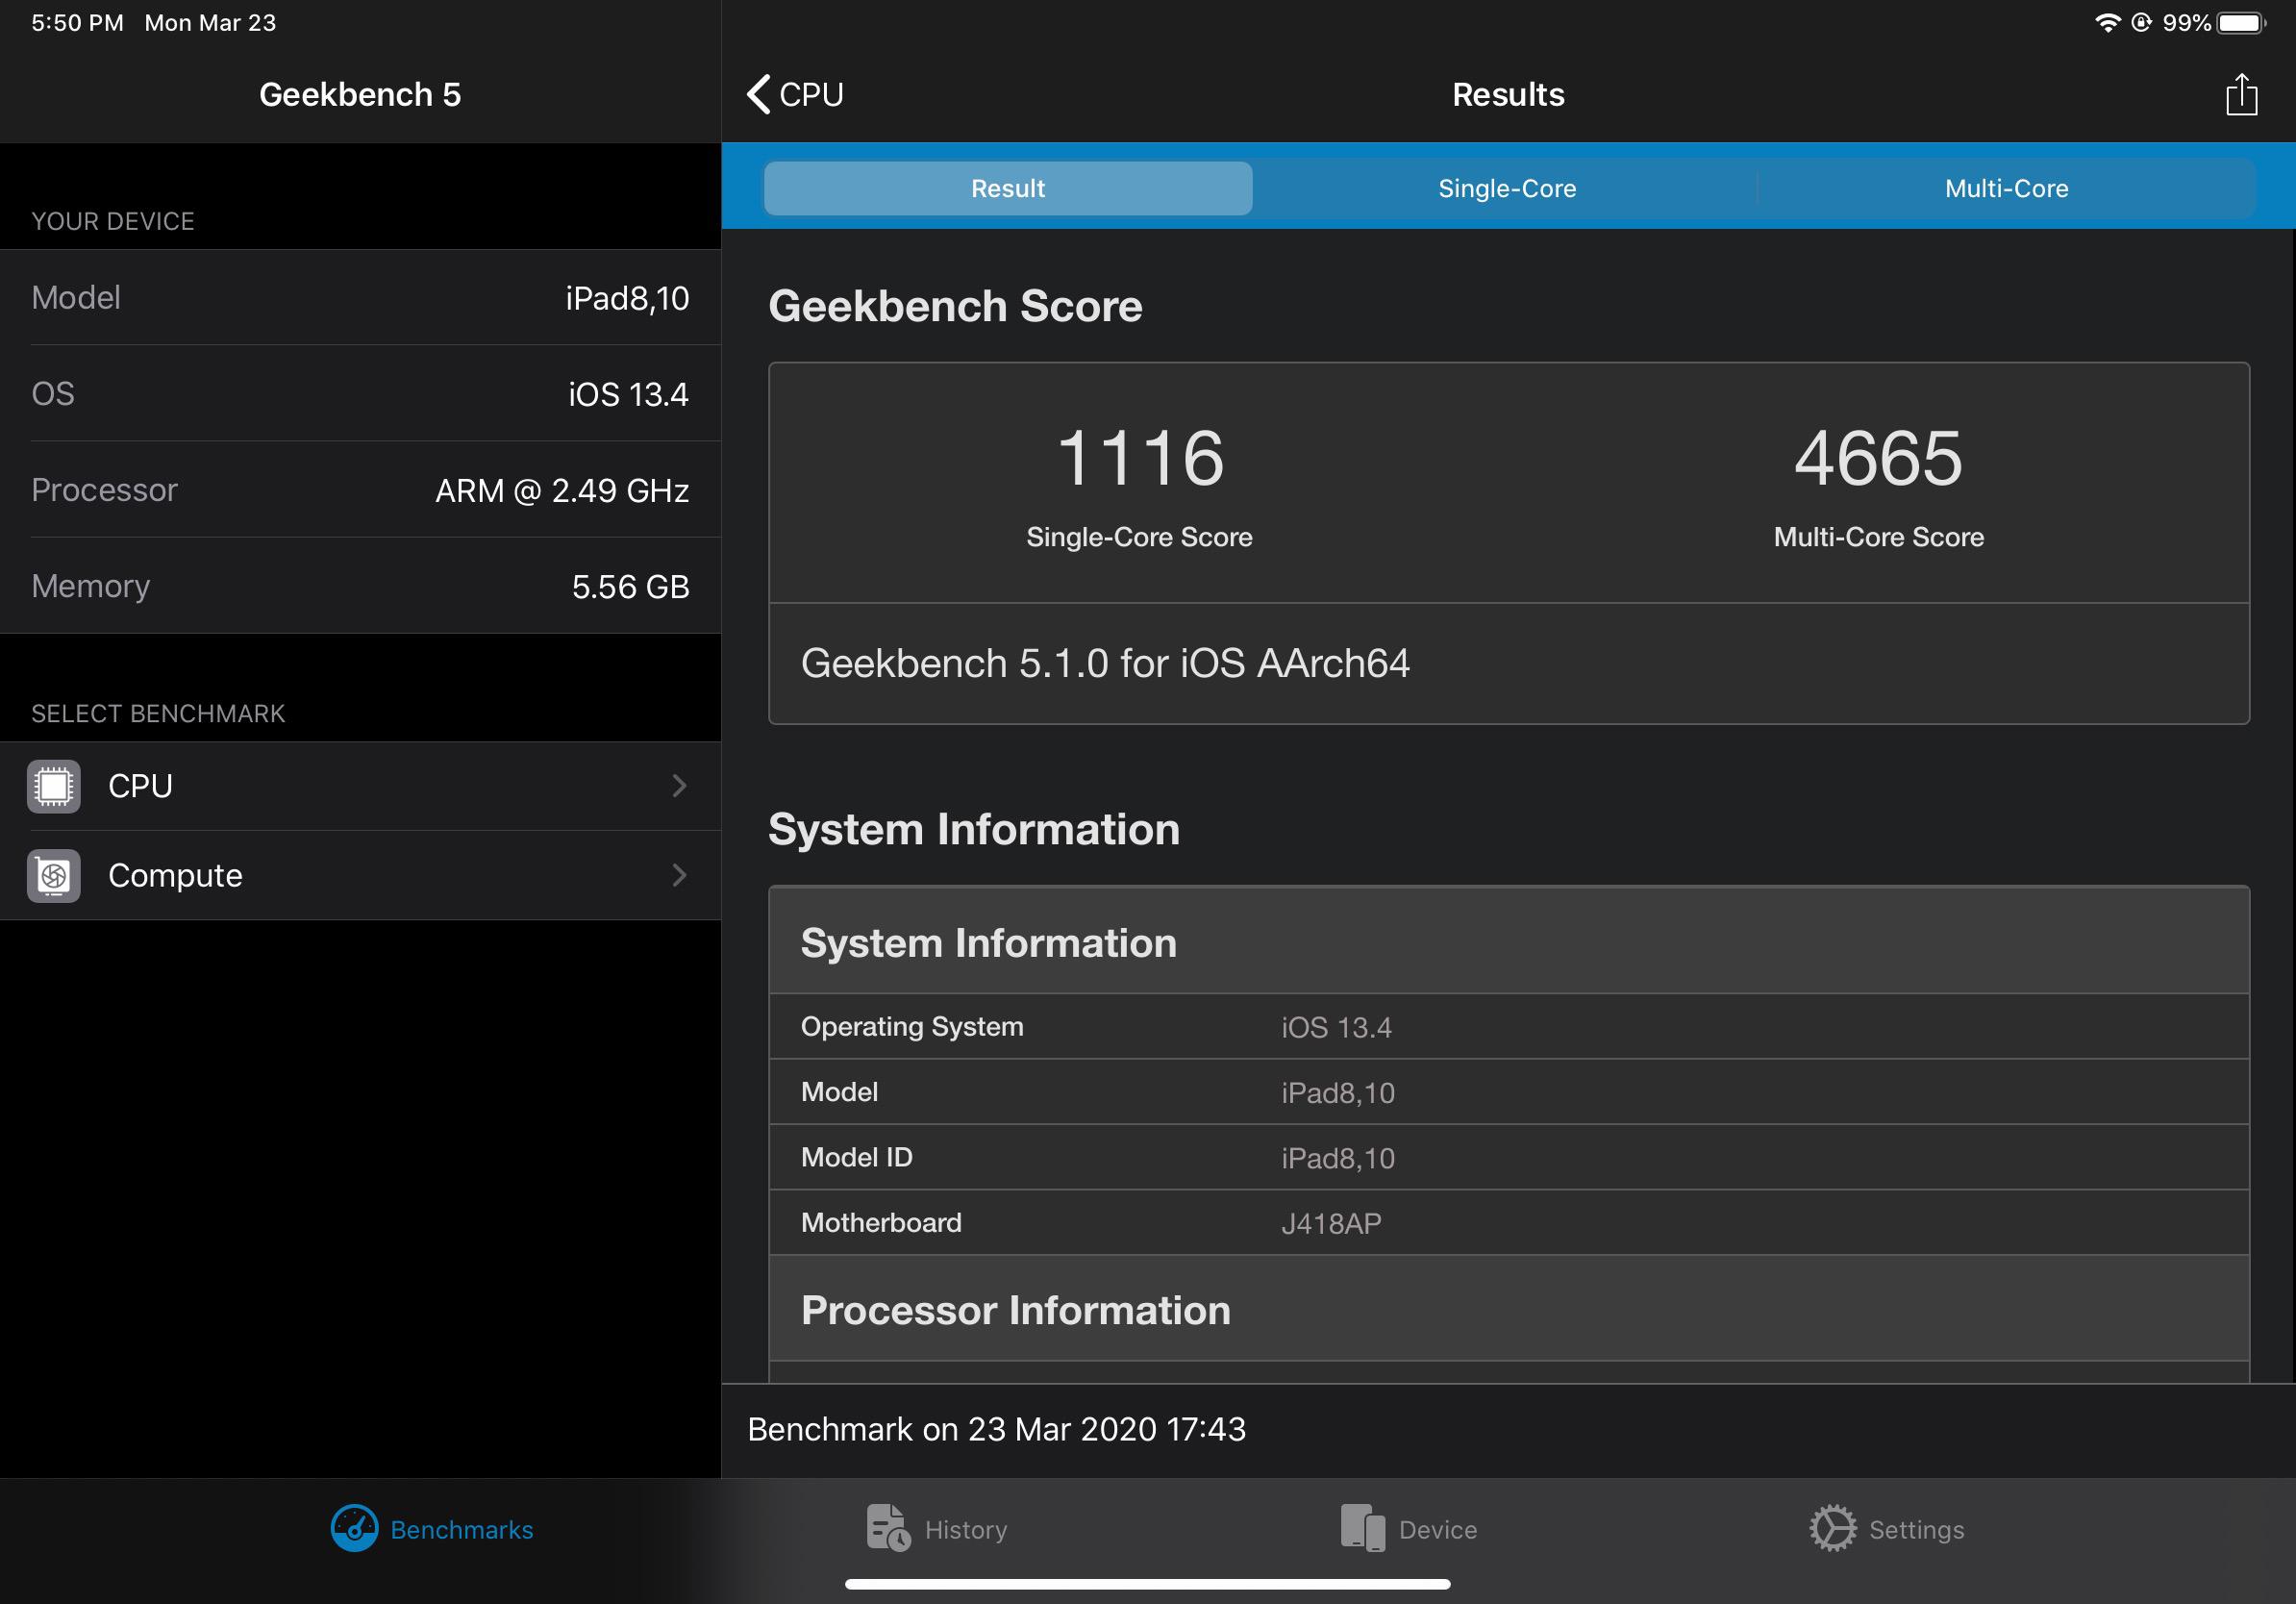 11-inch iPad Pro 2020 Geekbench score